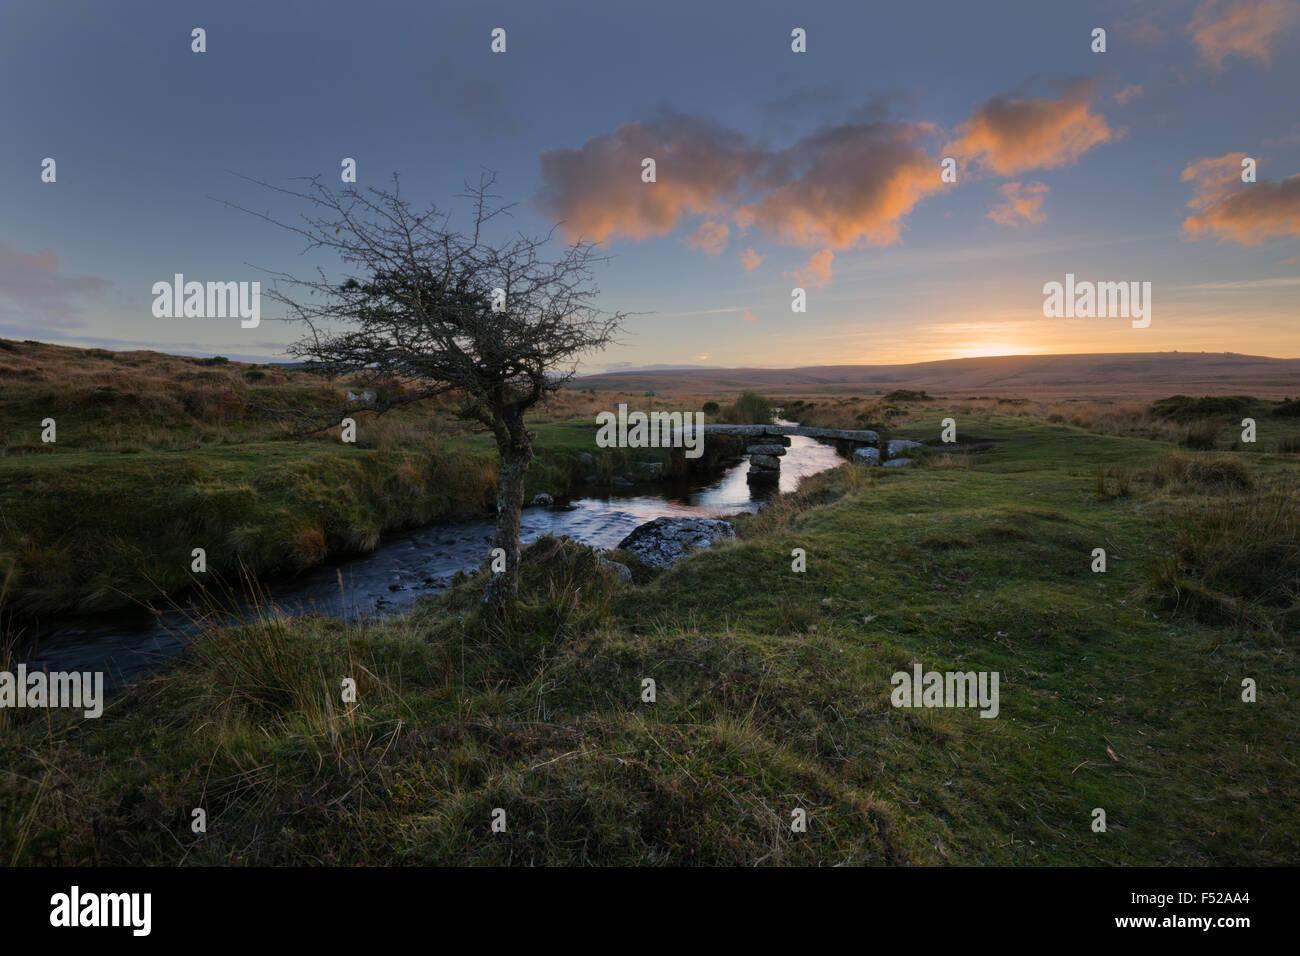 Sun setting over Scorhill on Dartmoor in West Devon - Stock Image